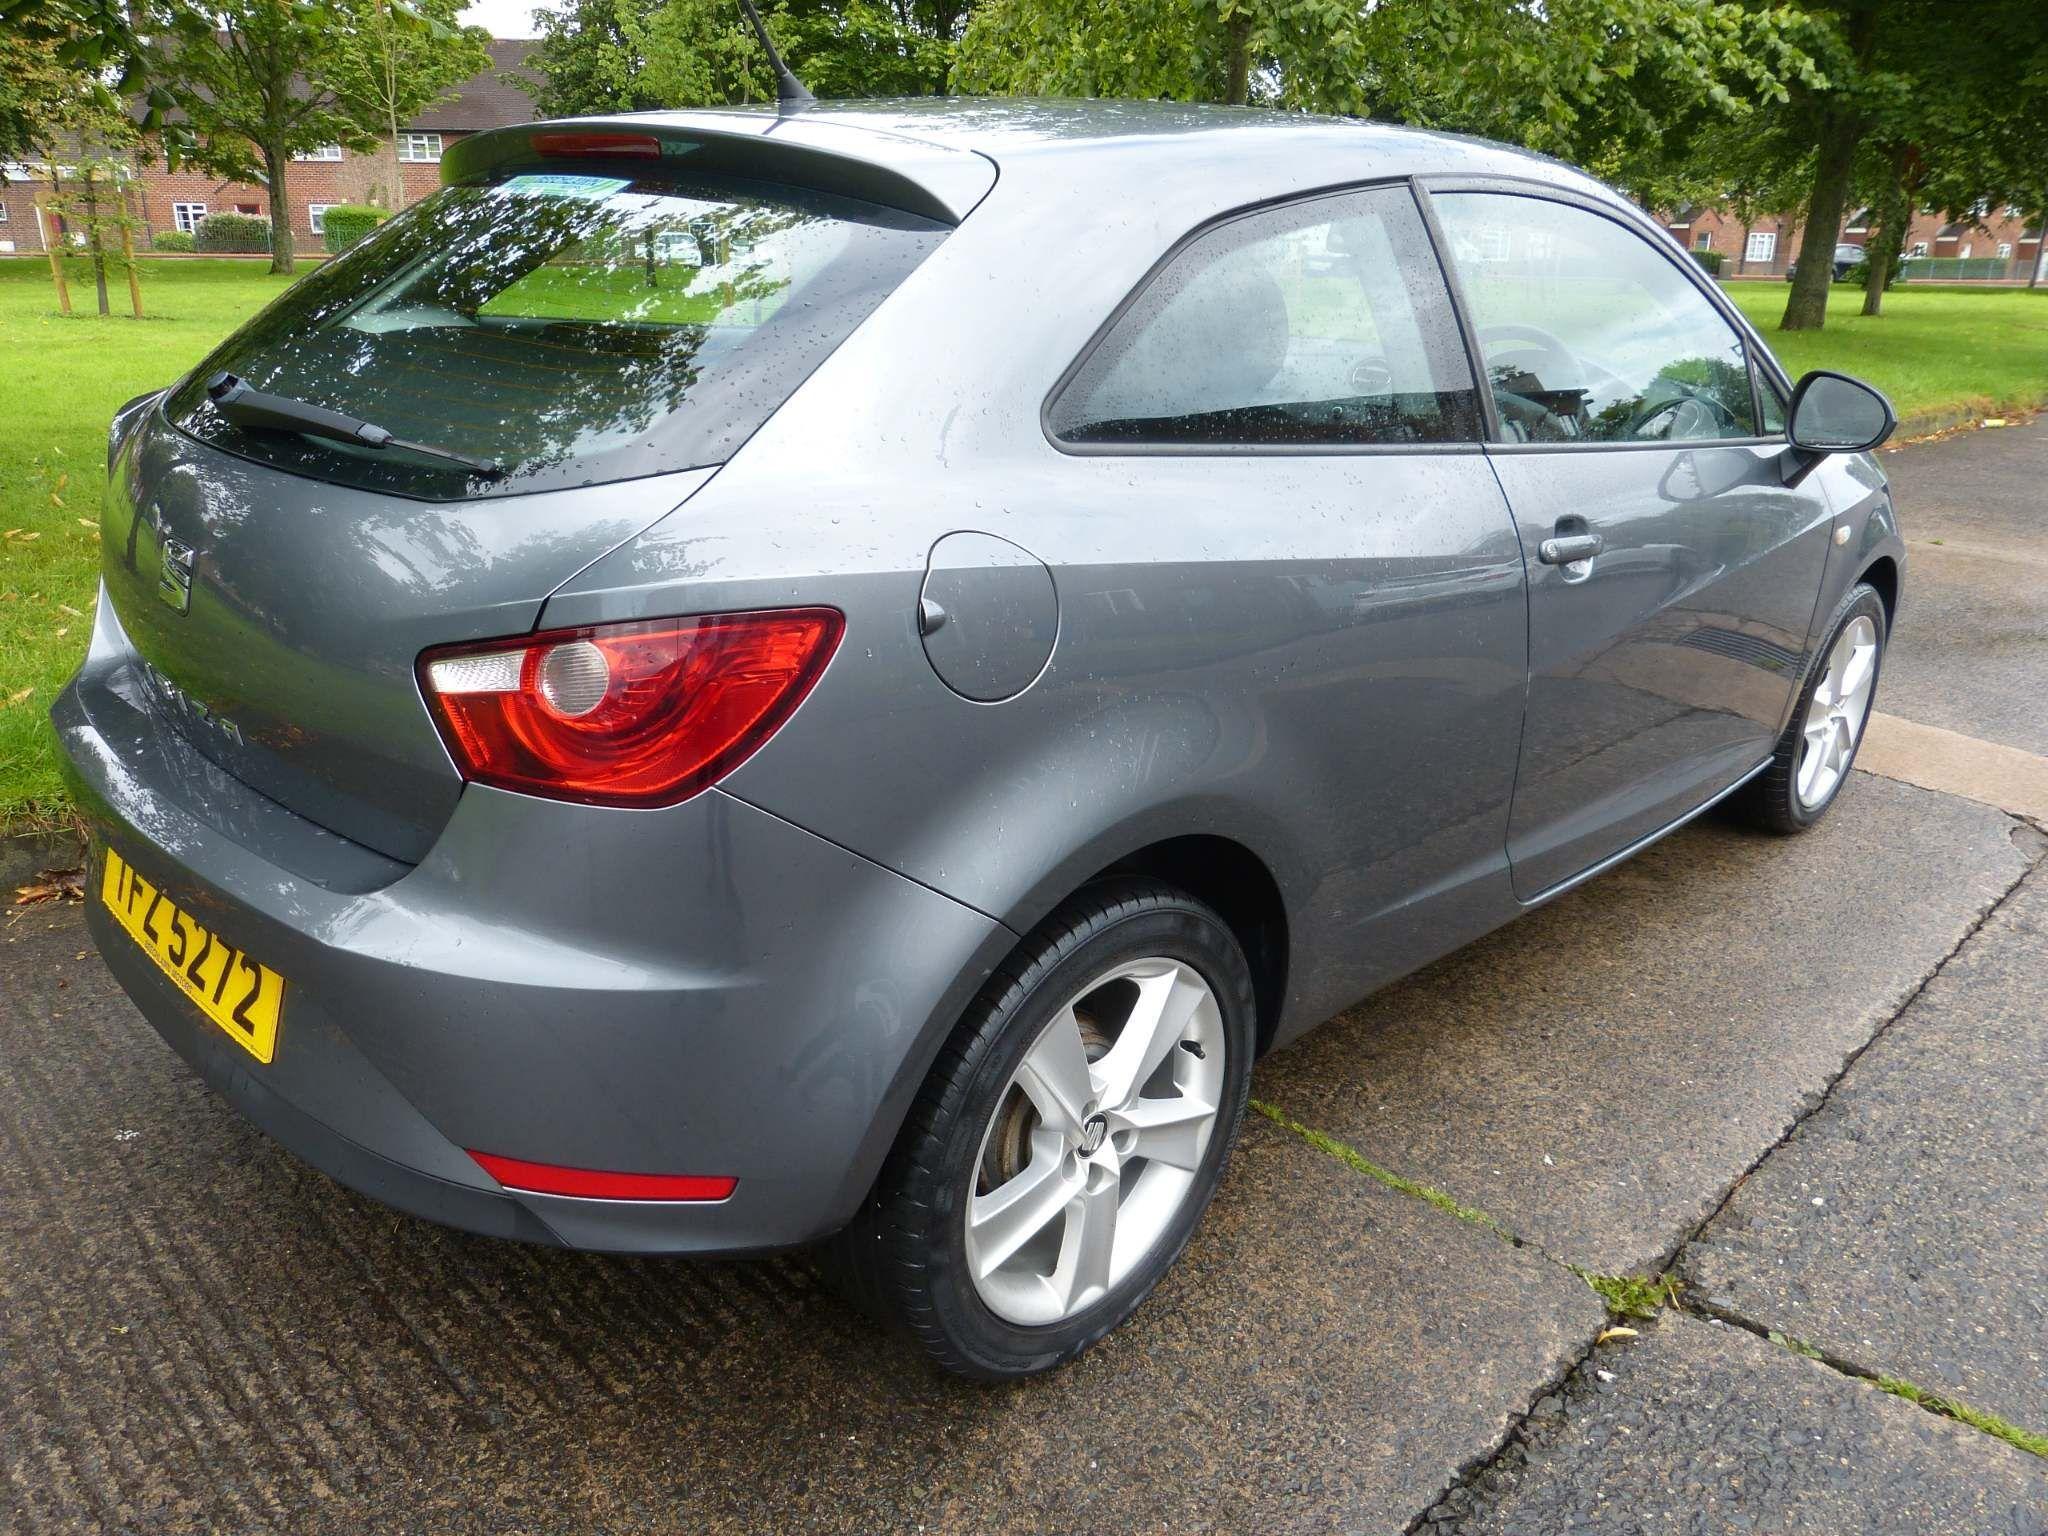 2014 SEAT Ibiza 1.4 16v Toca SportCoupe Petrol Manual  – Beechlawn Motors Belfast full